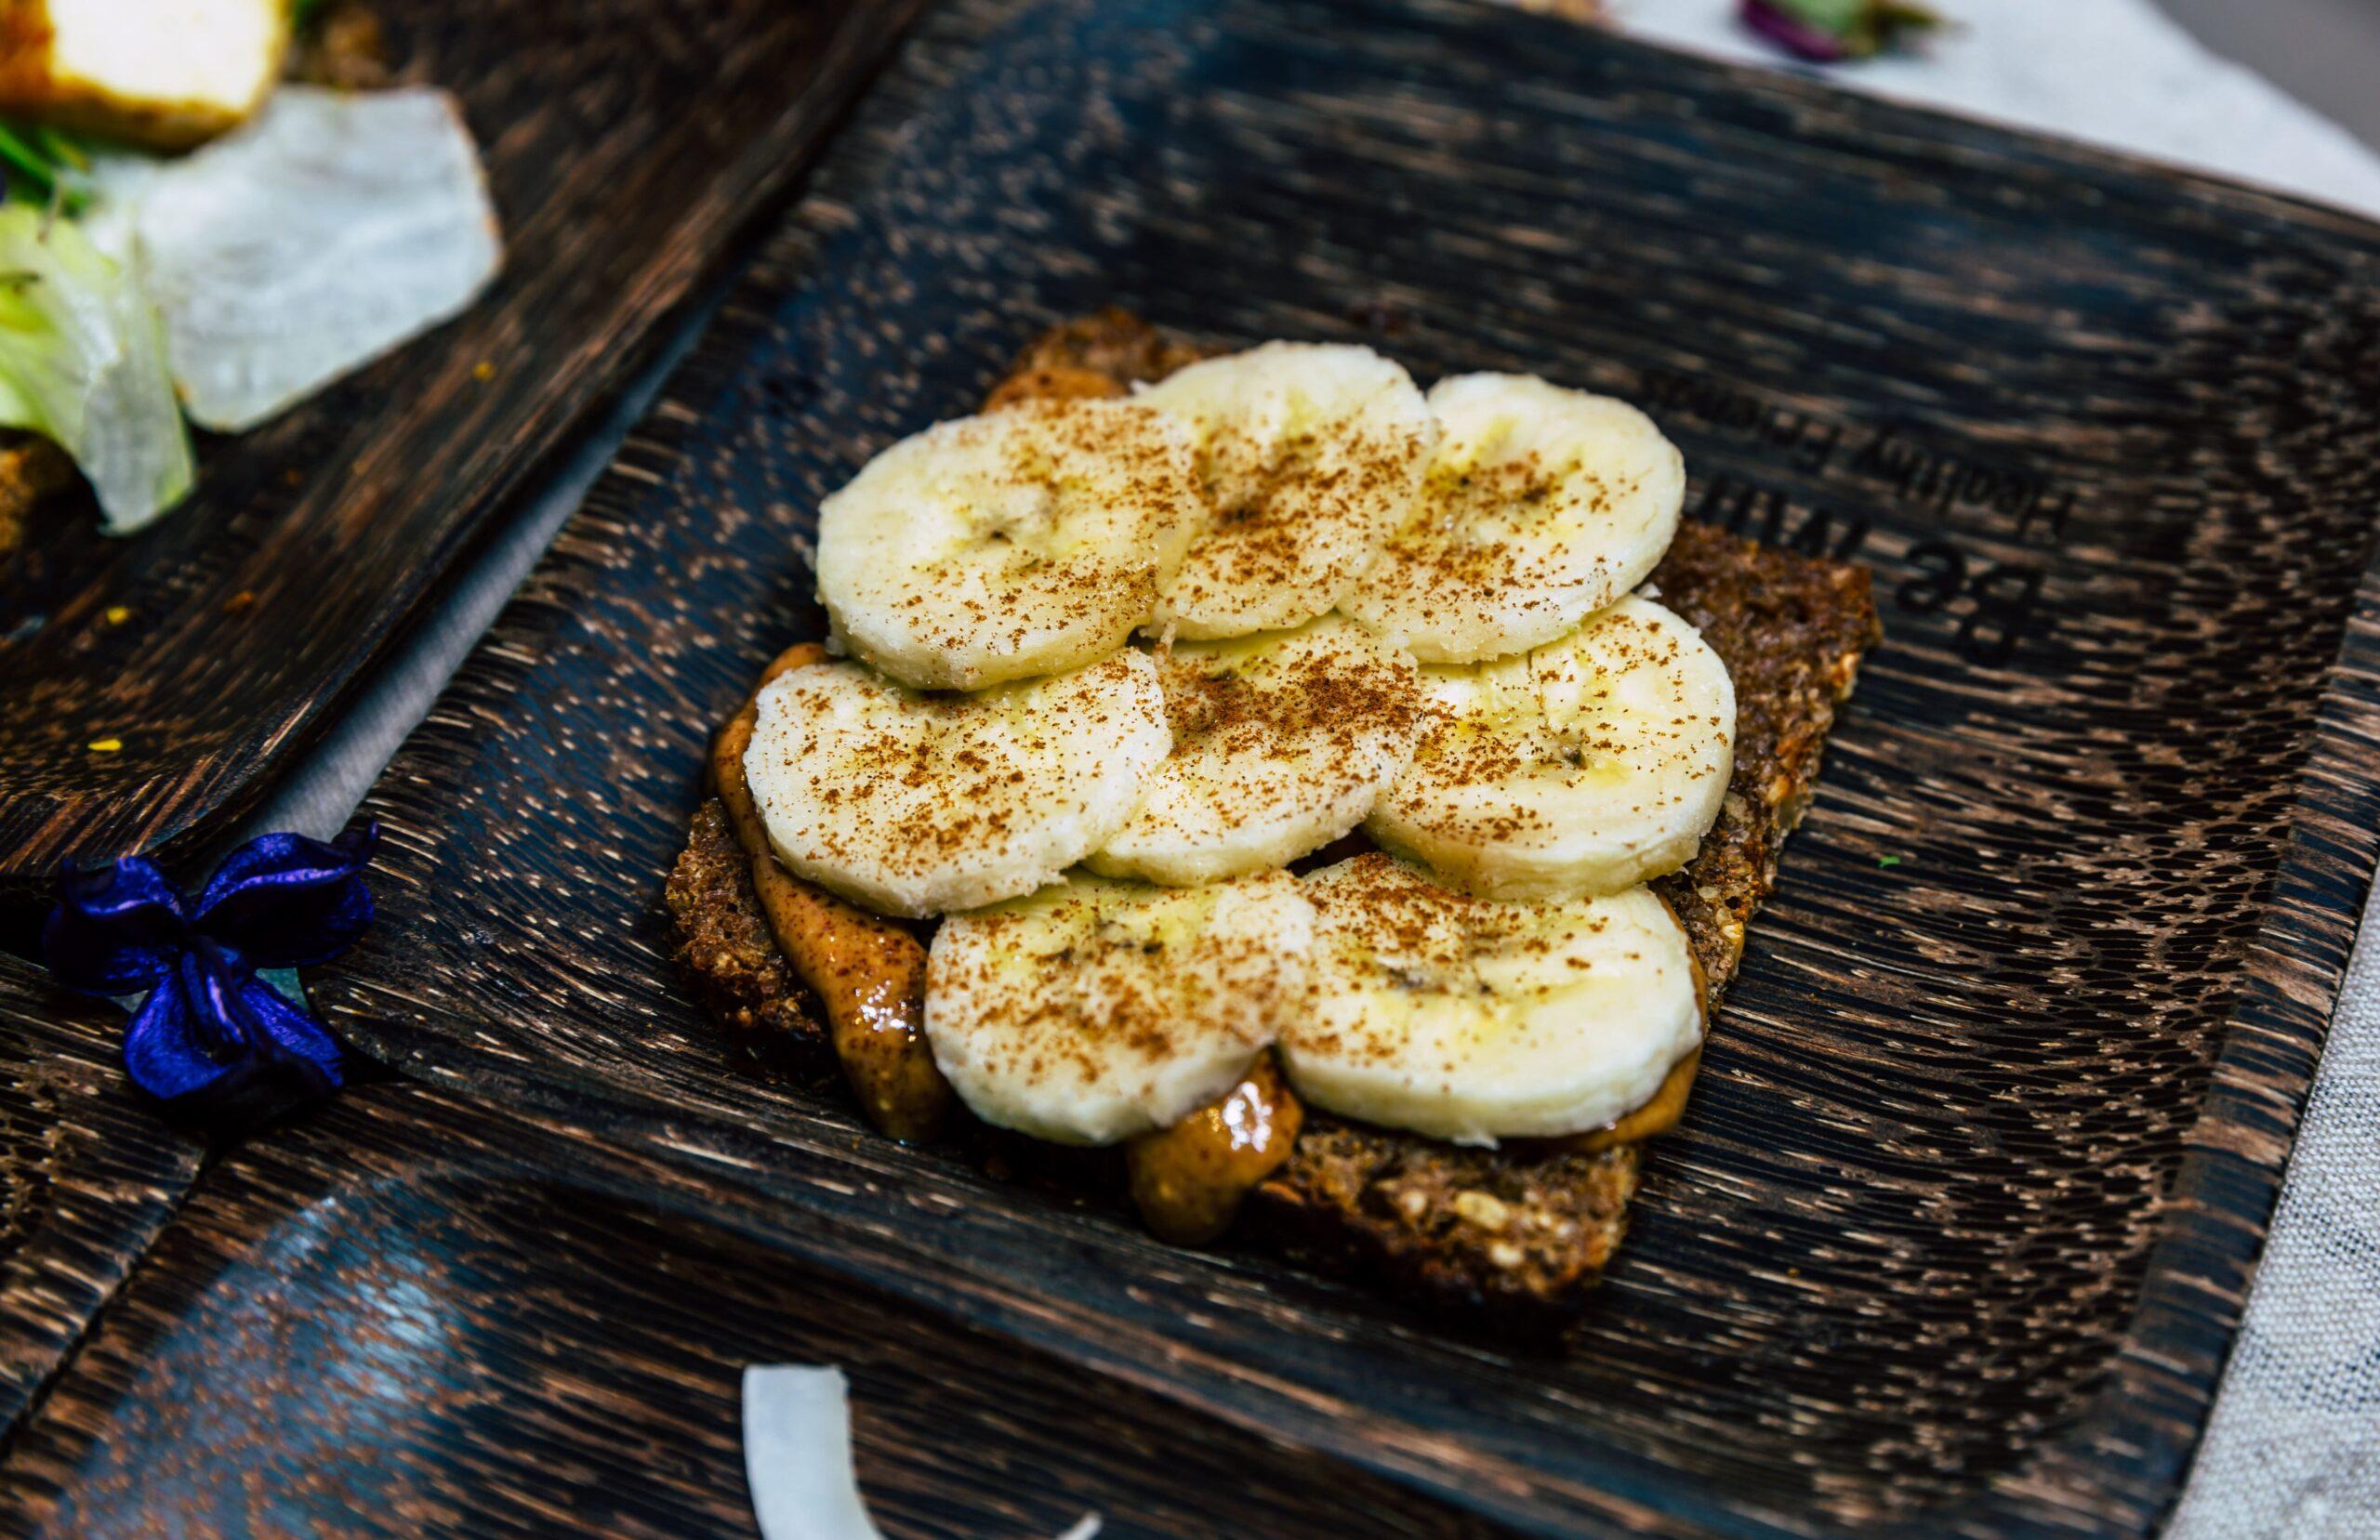 Organic Rye Bread with Organic Peanut Butter, Banana, and Cinnamon